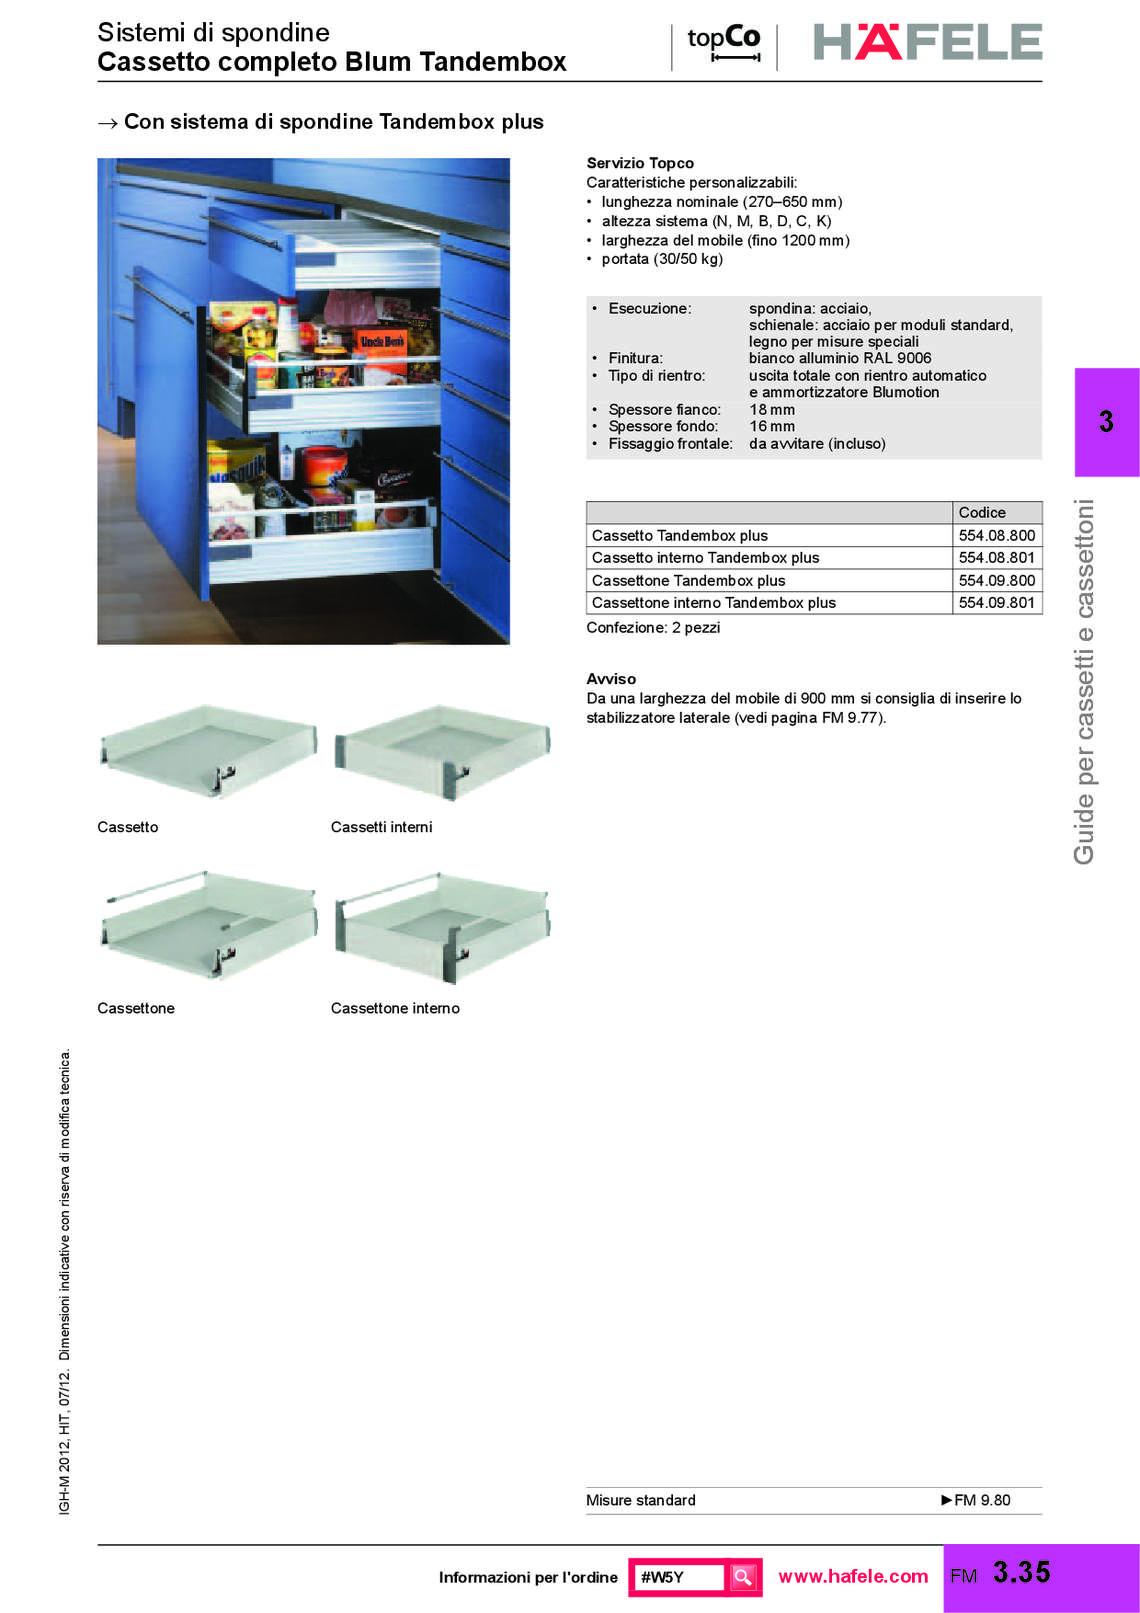 hafele-prodotti-su-misura_81_048.jpg